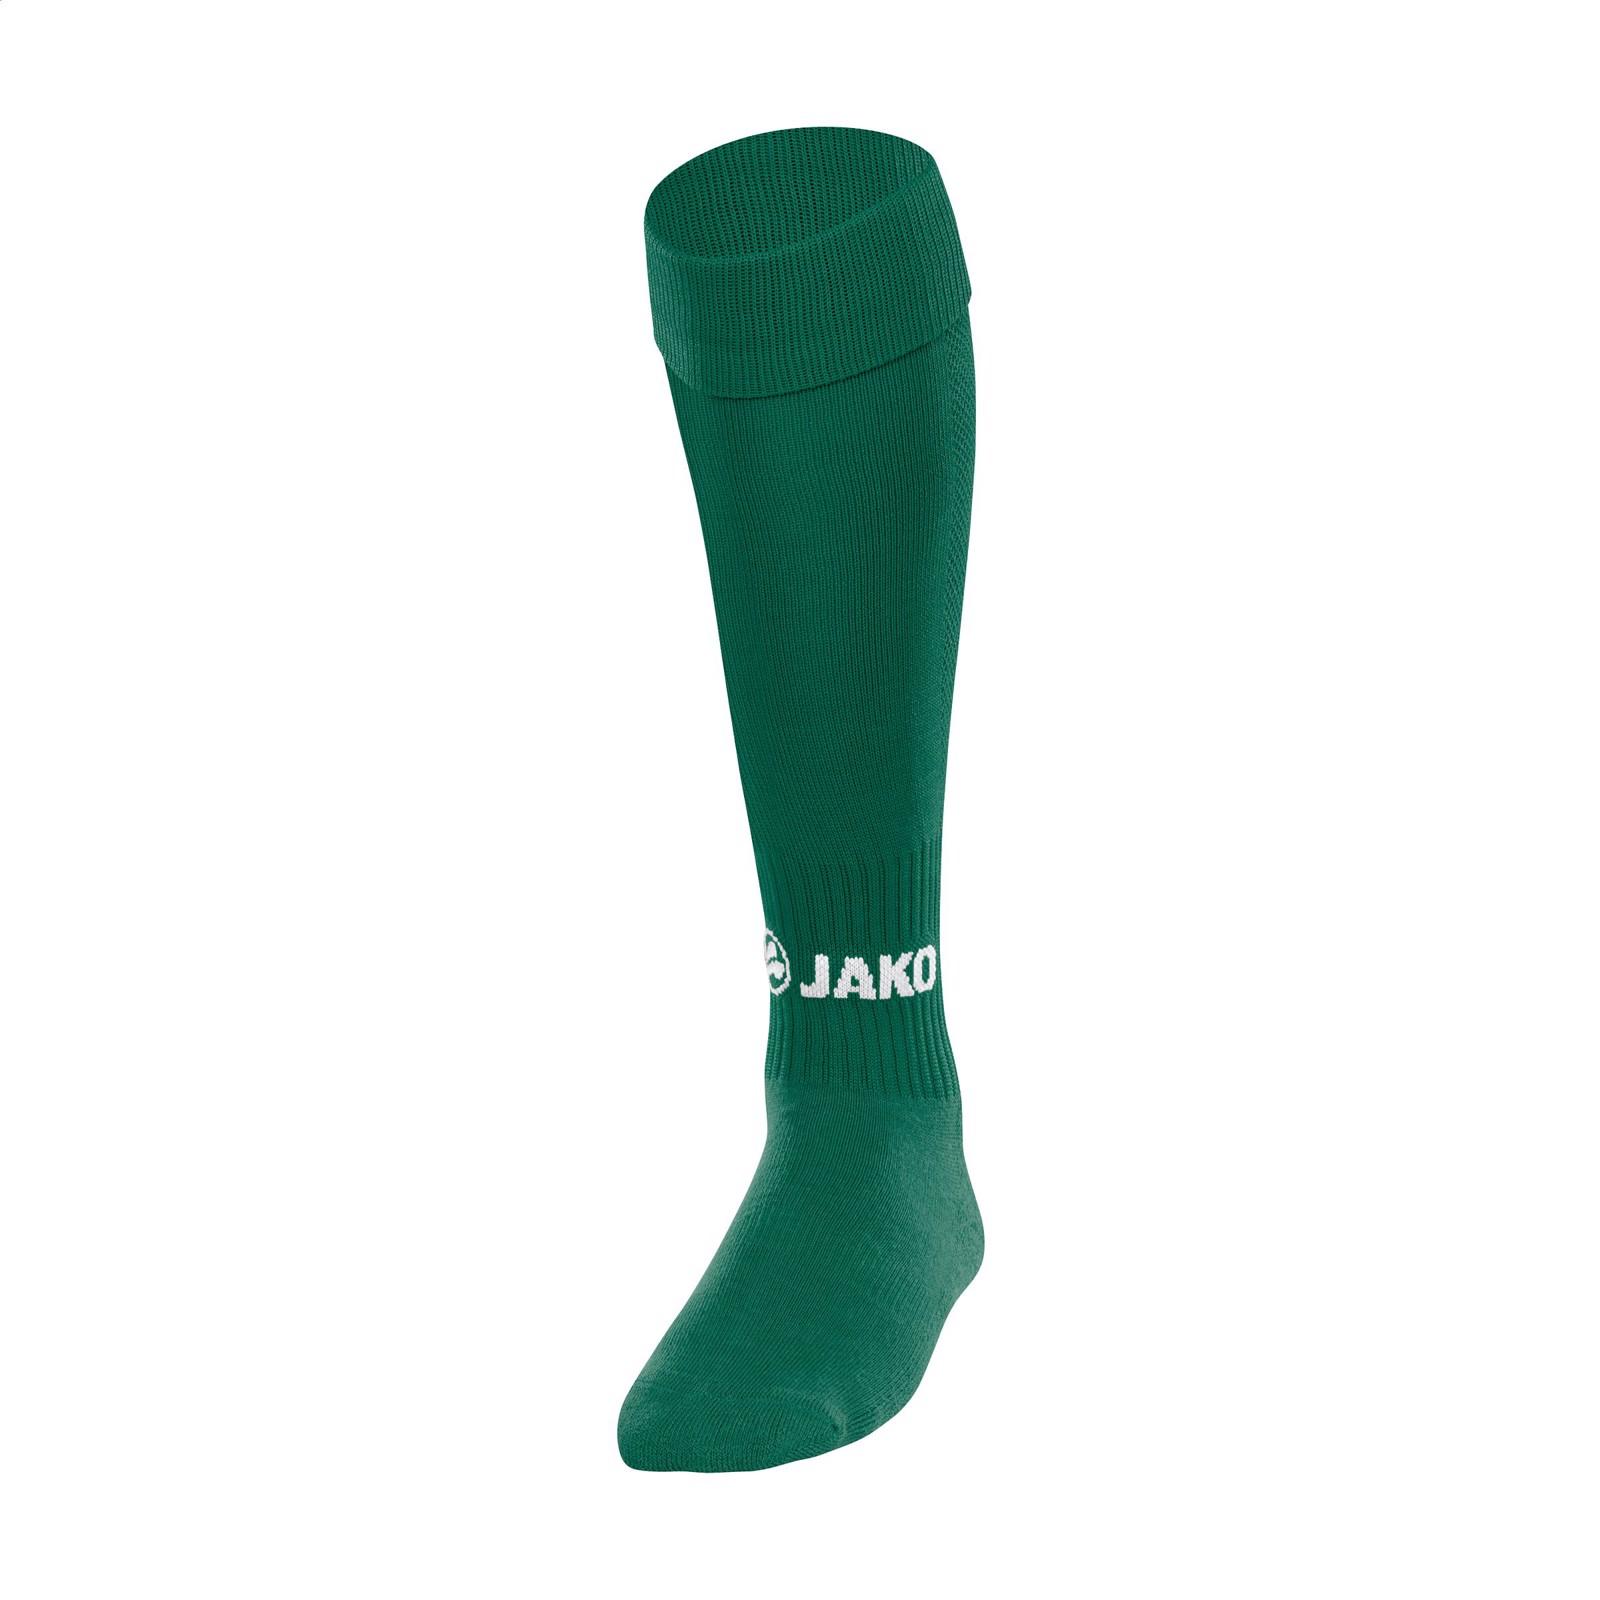 Jako® Glasgow Sport Socks Kids - Green / M